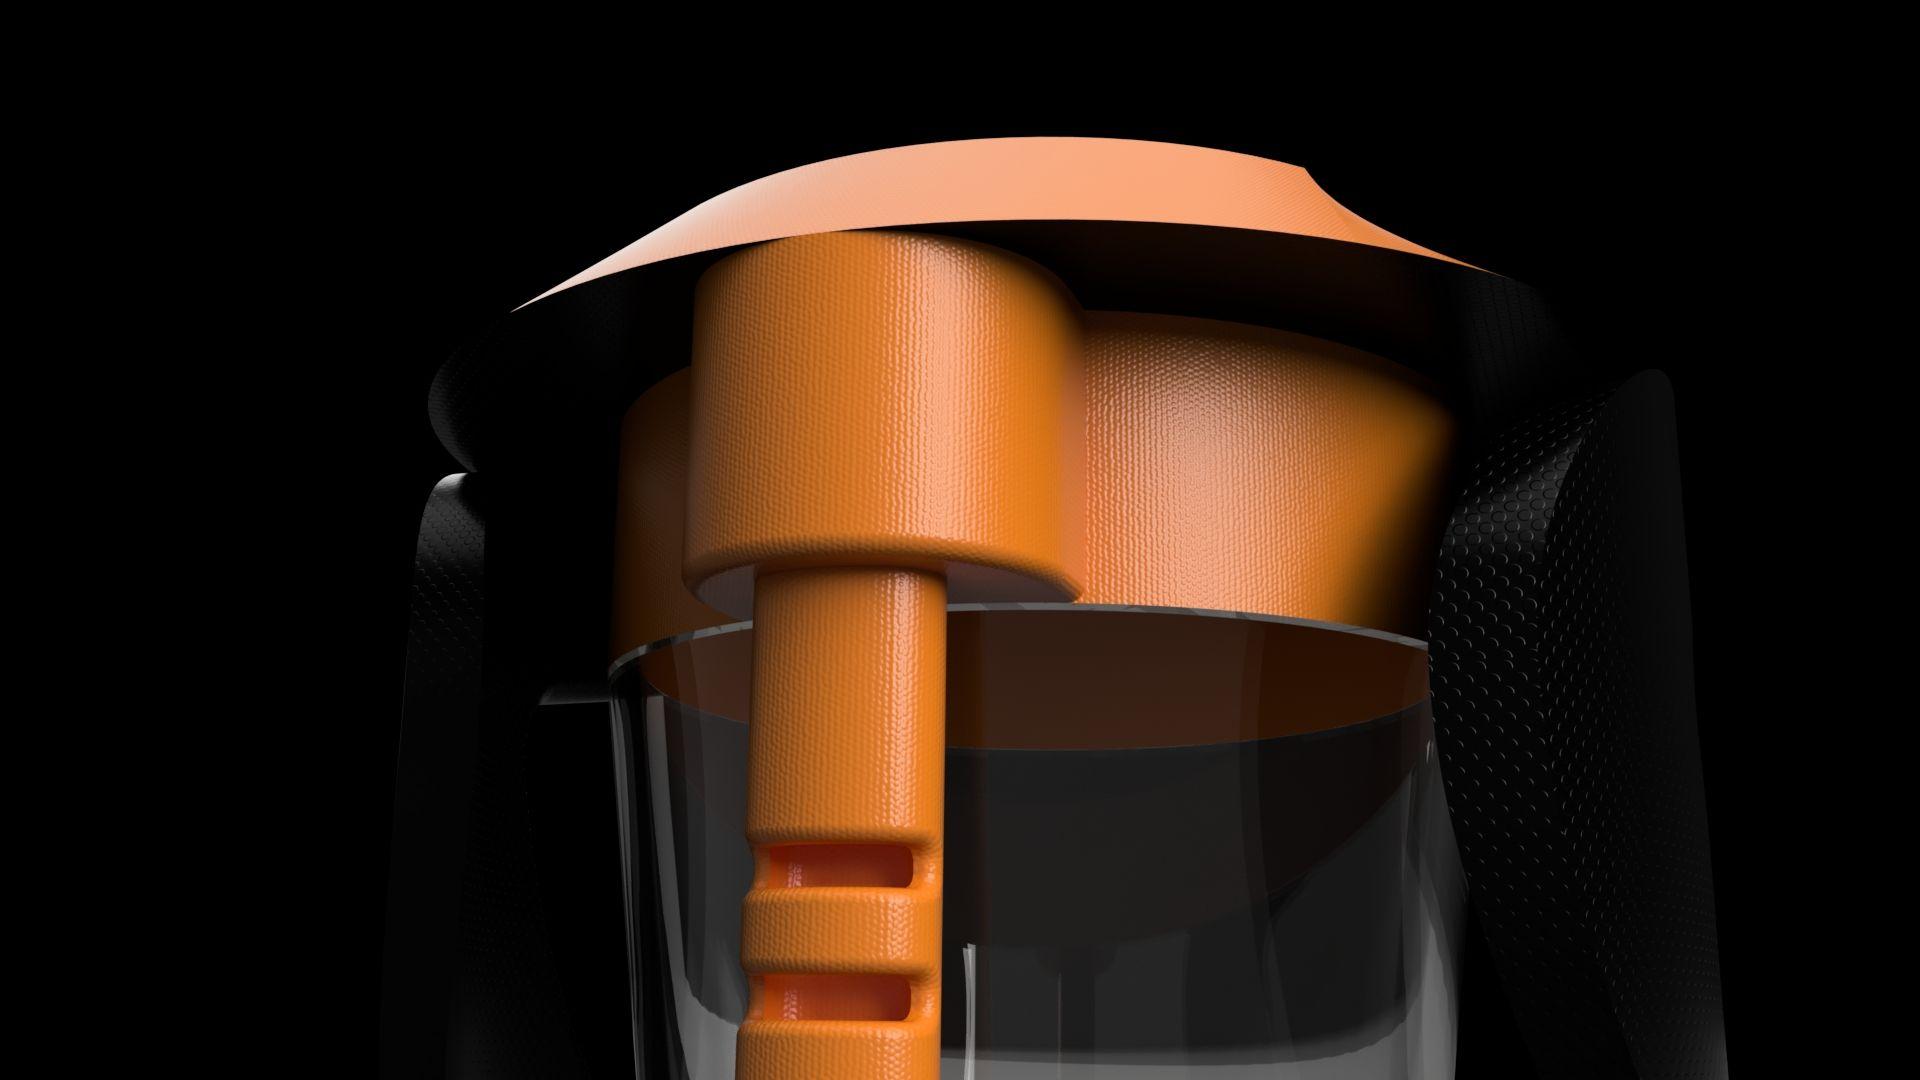 Liq-design-lcs2018-fabrica-de-nerdes-9-3500-3500